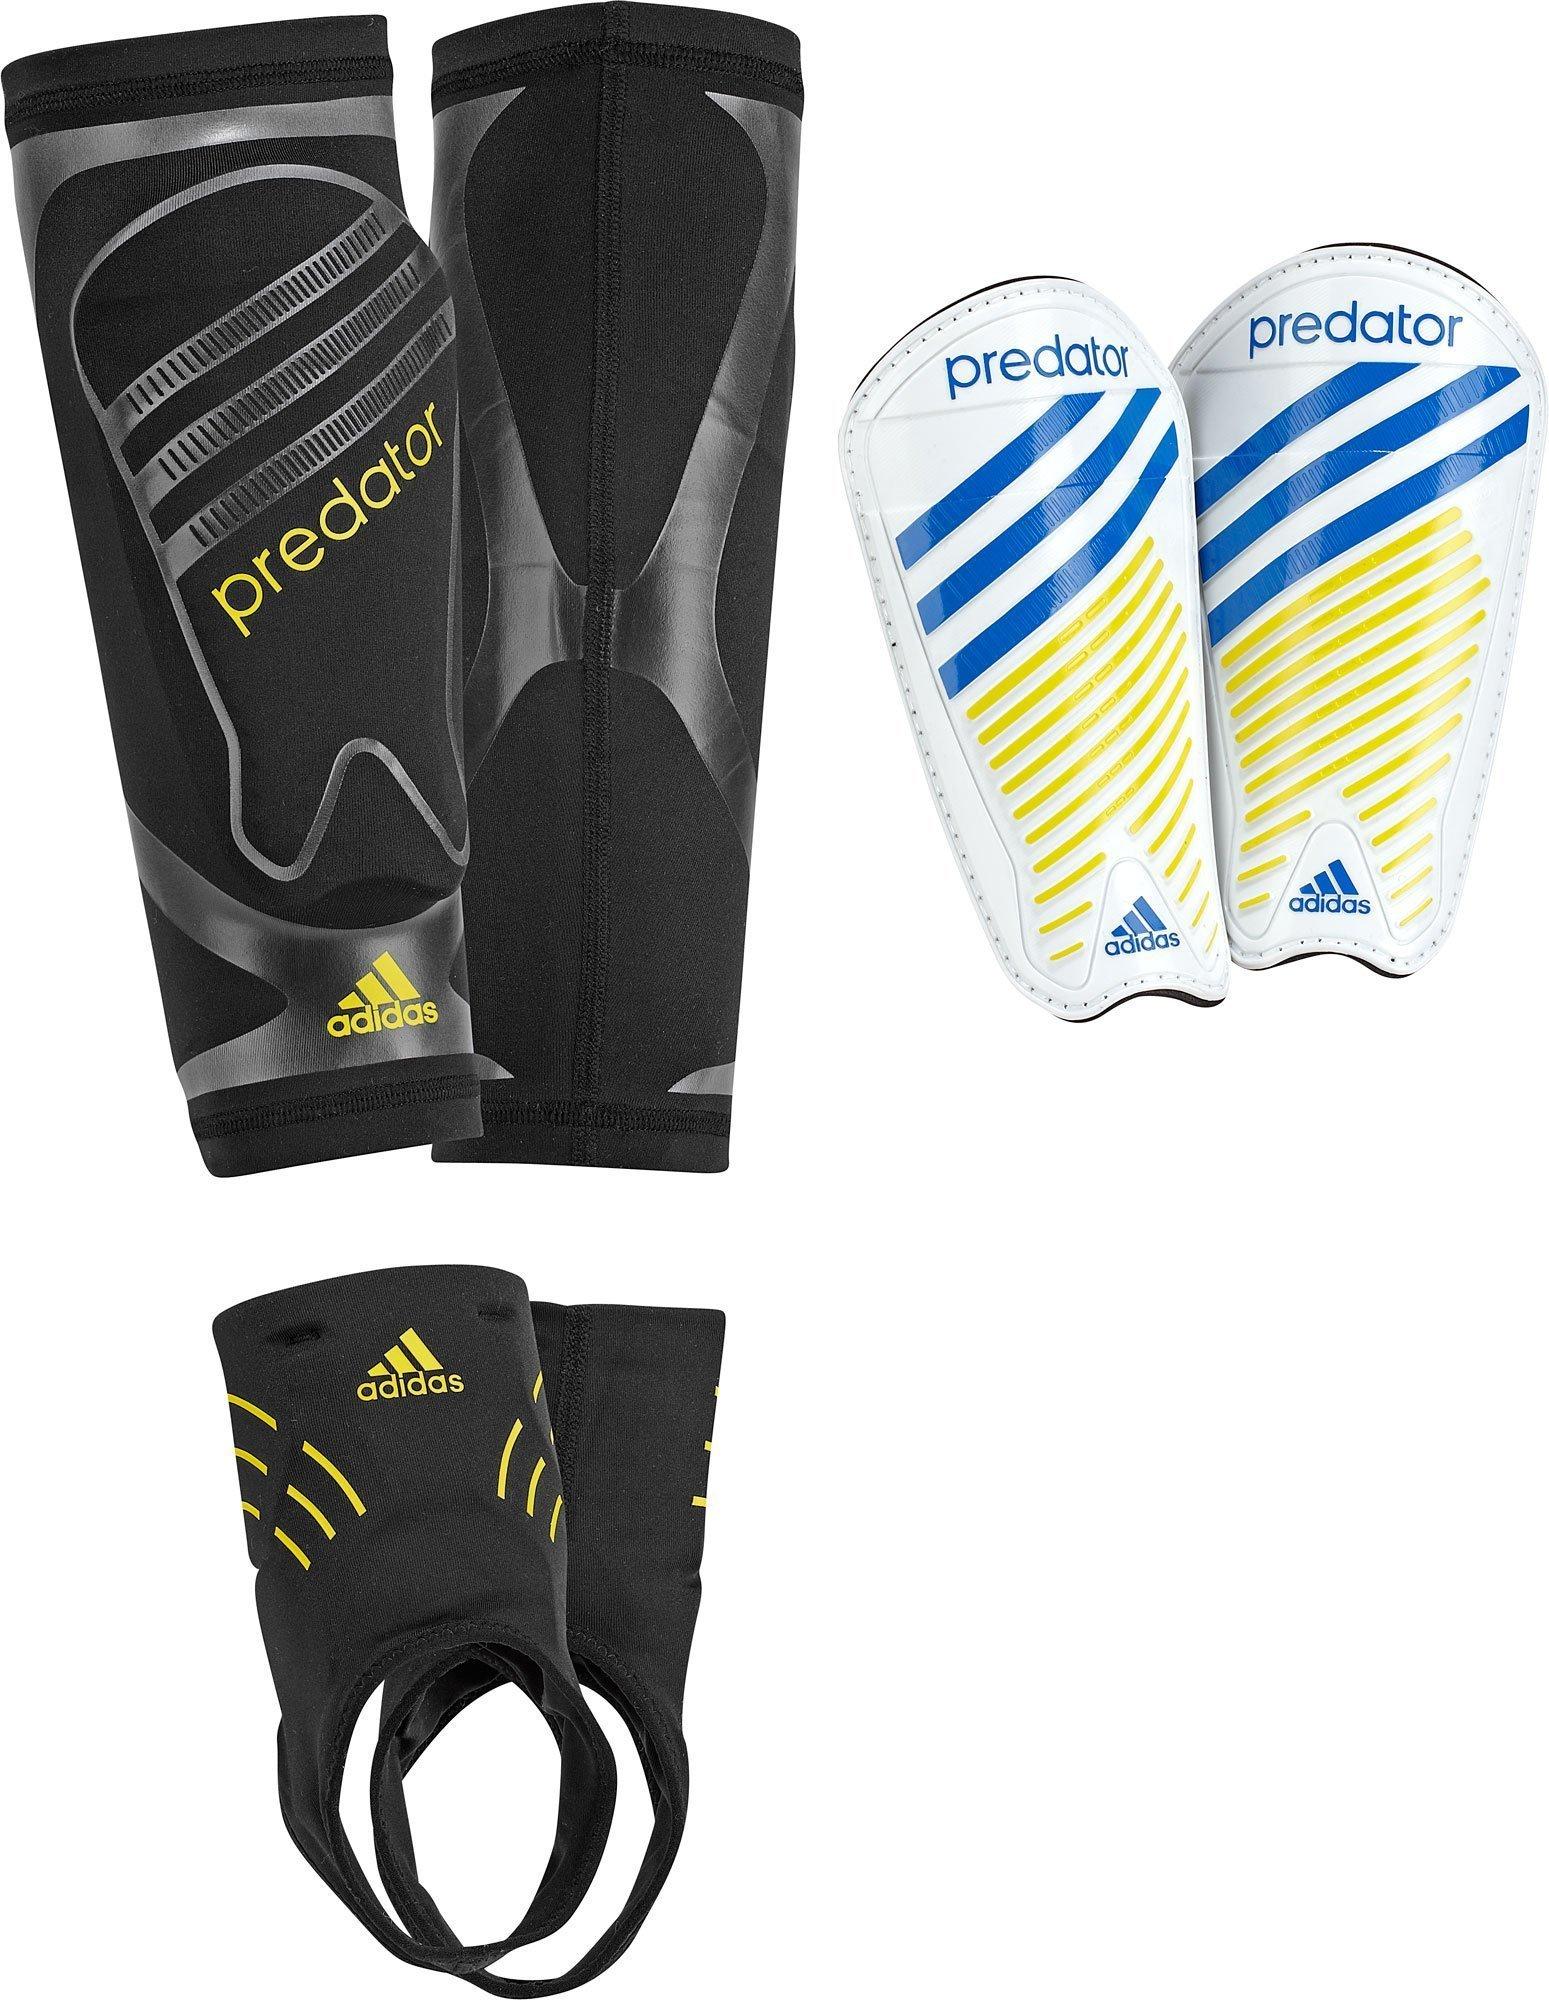 Adidas sport performance – Adidas predator molded fra billigsport24